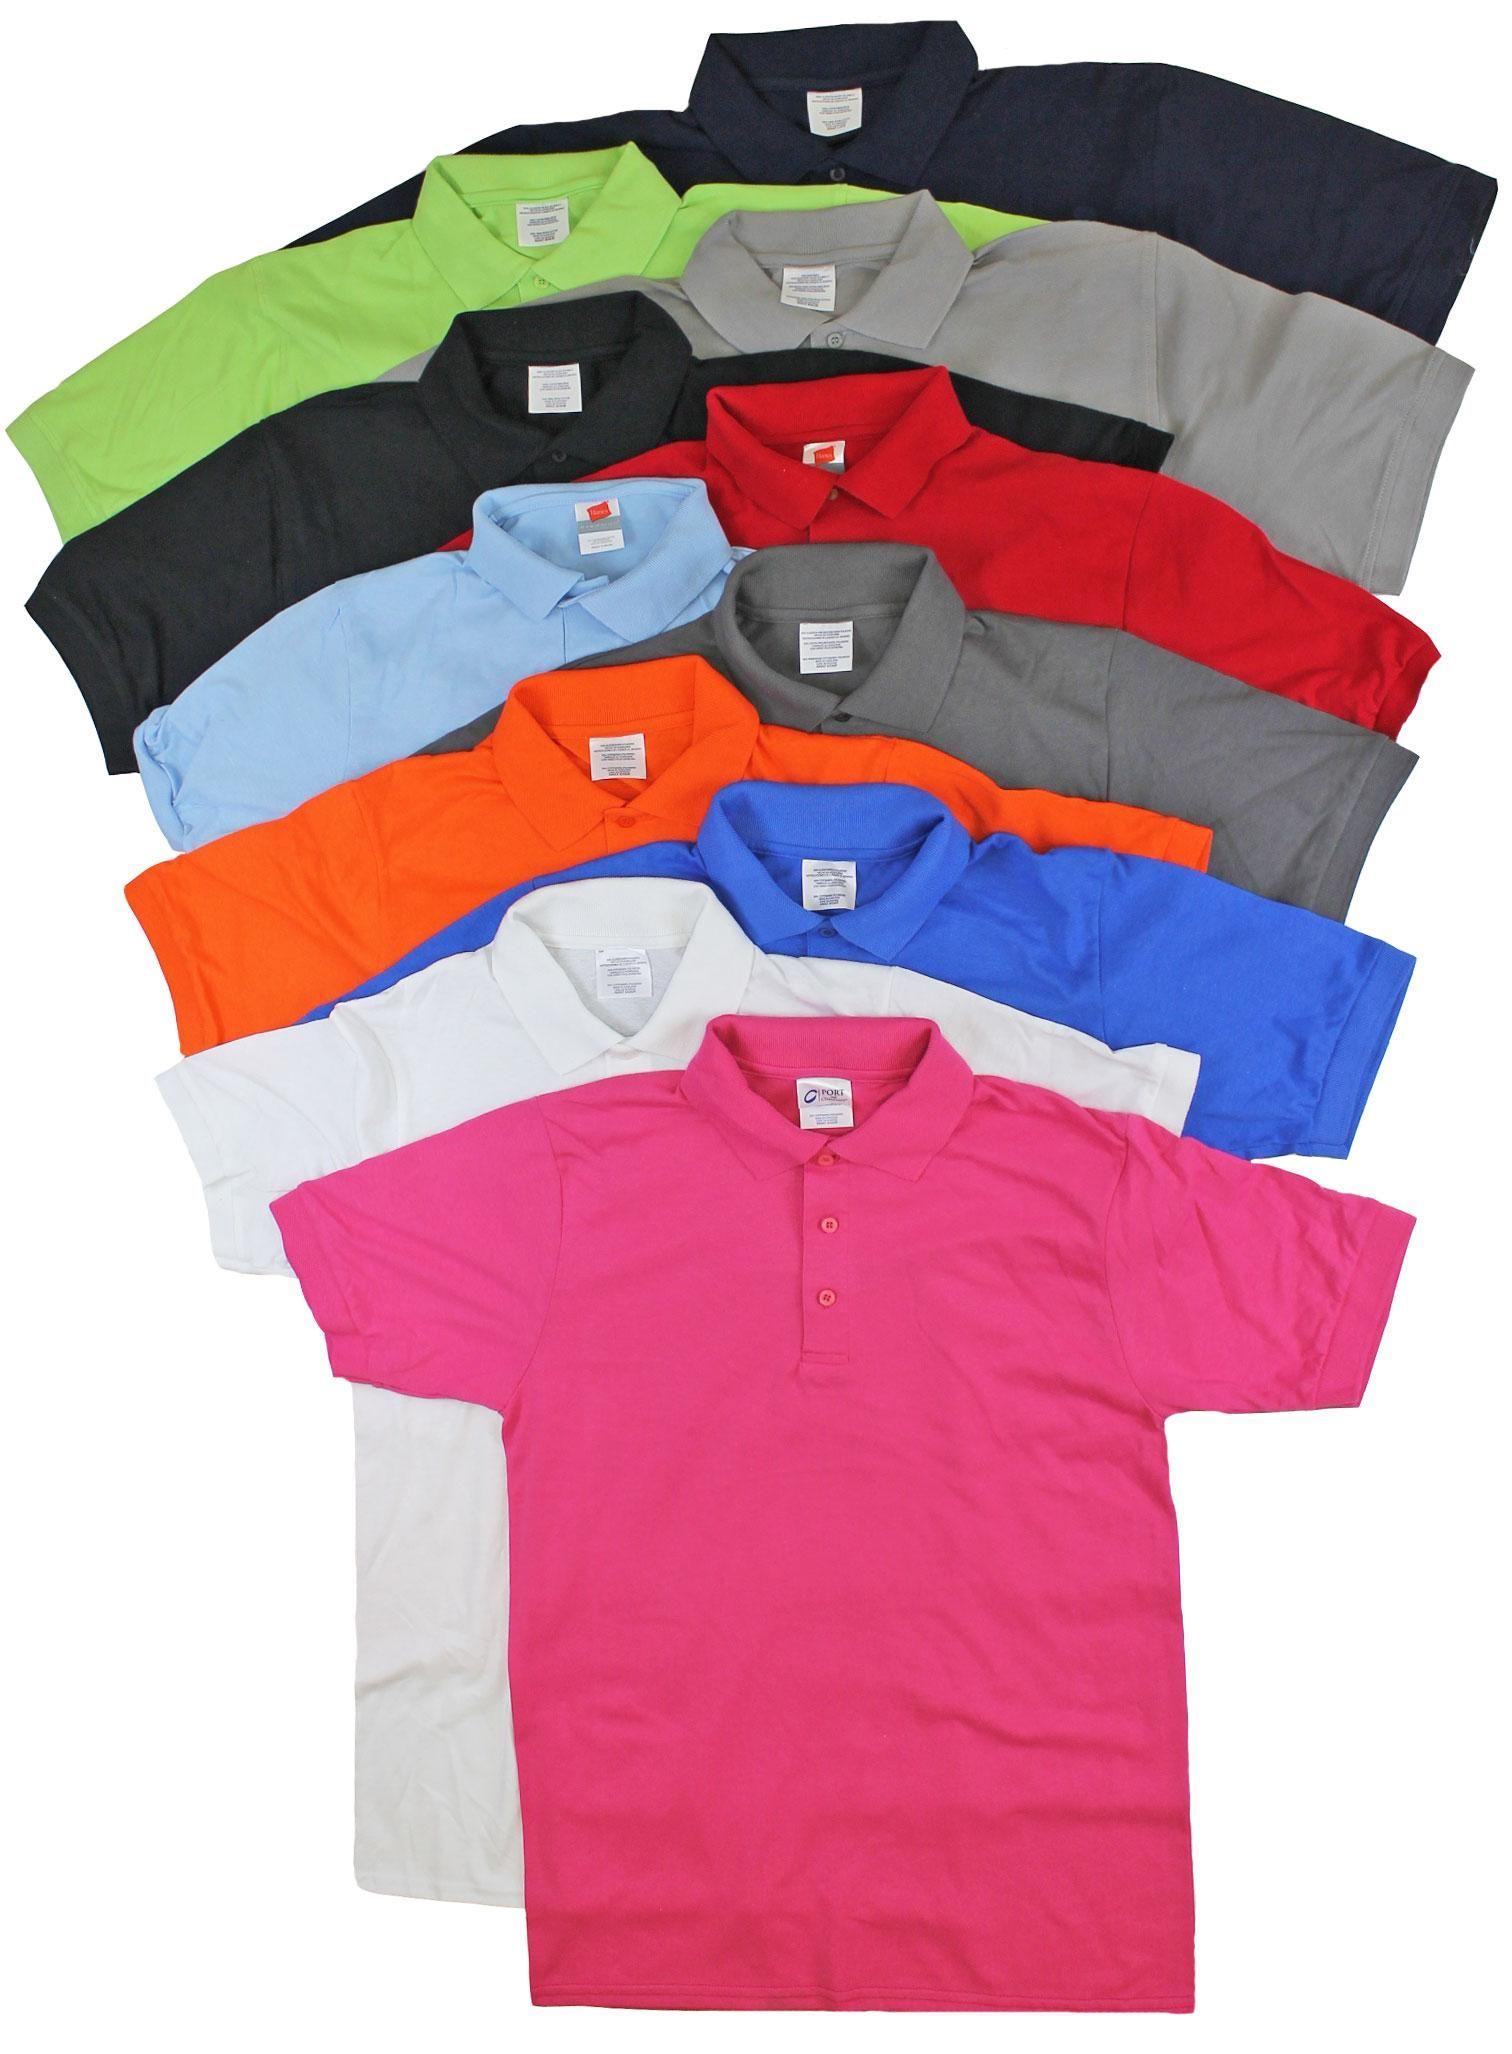 810680f83b1 Mens Polos - 36 pcs in 2019 | Irregular Product | Bulk tee shirts ...